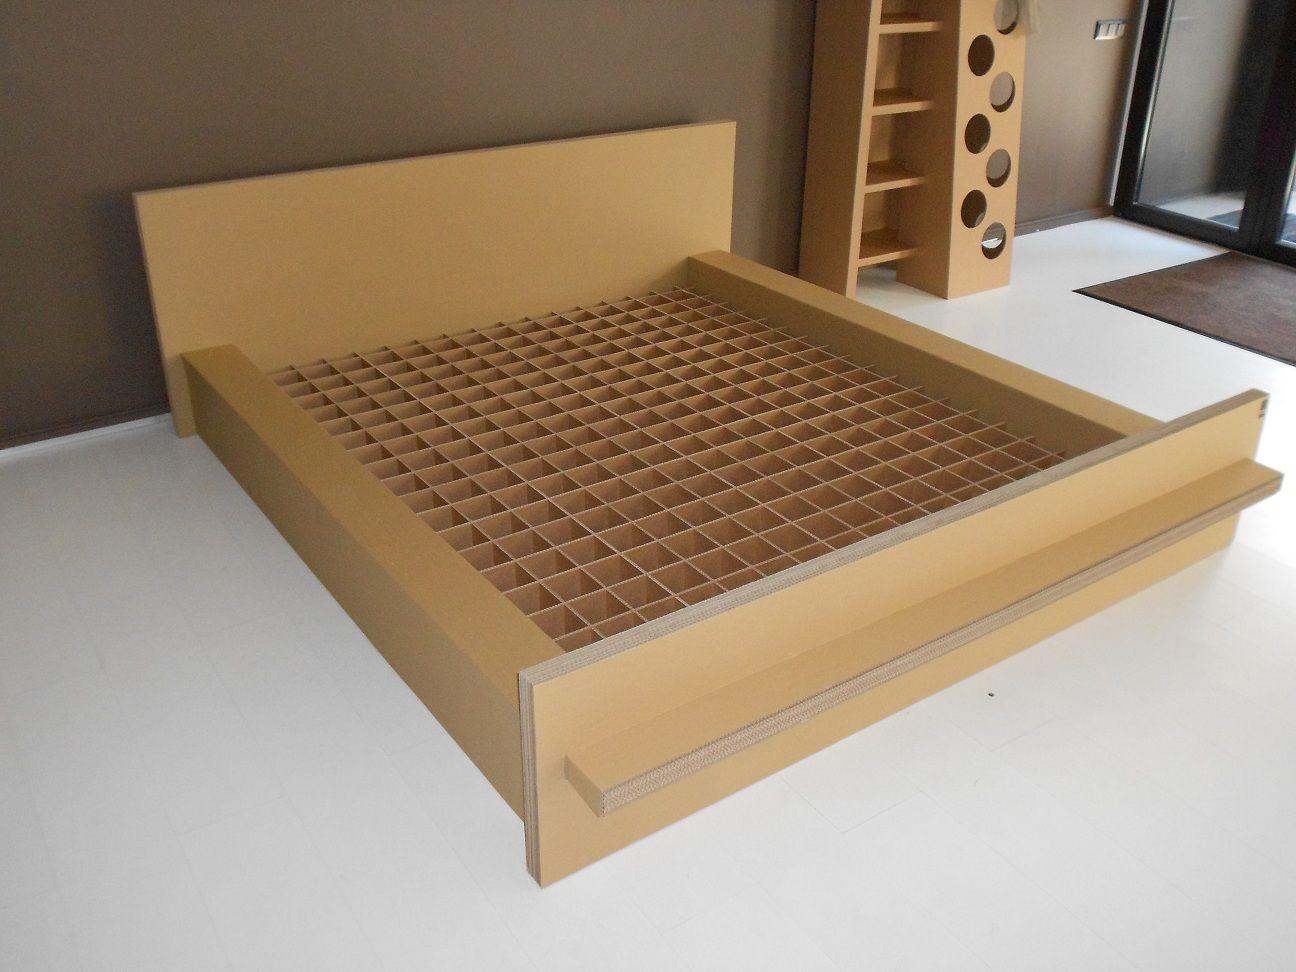 Diy cardboard furniture - Find This Pin And More On Cardboard Furniture